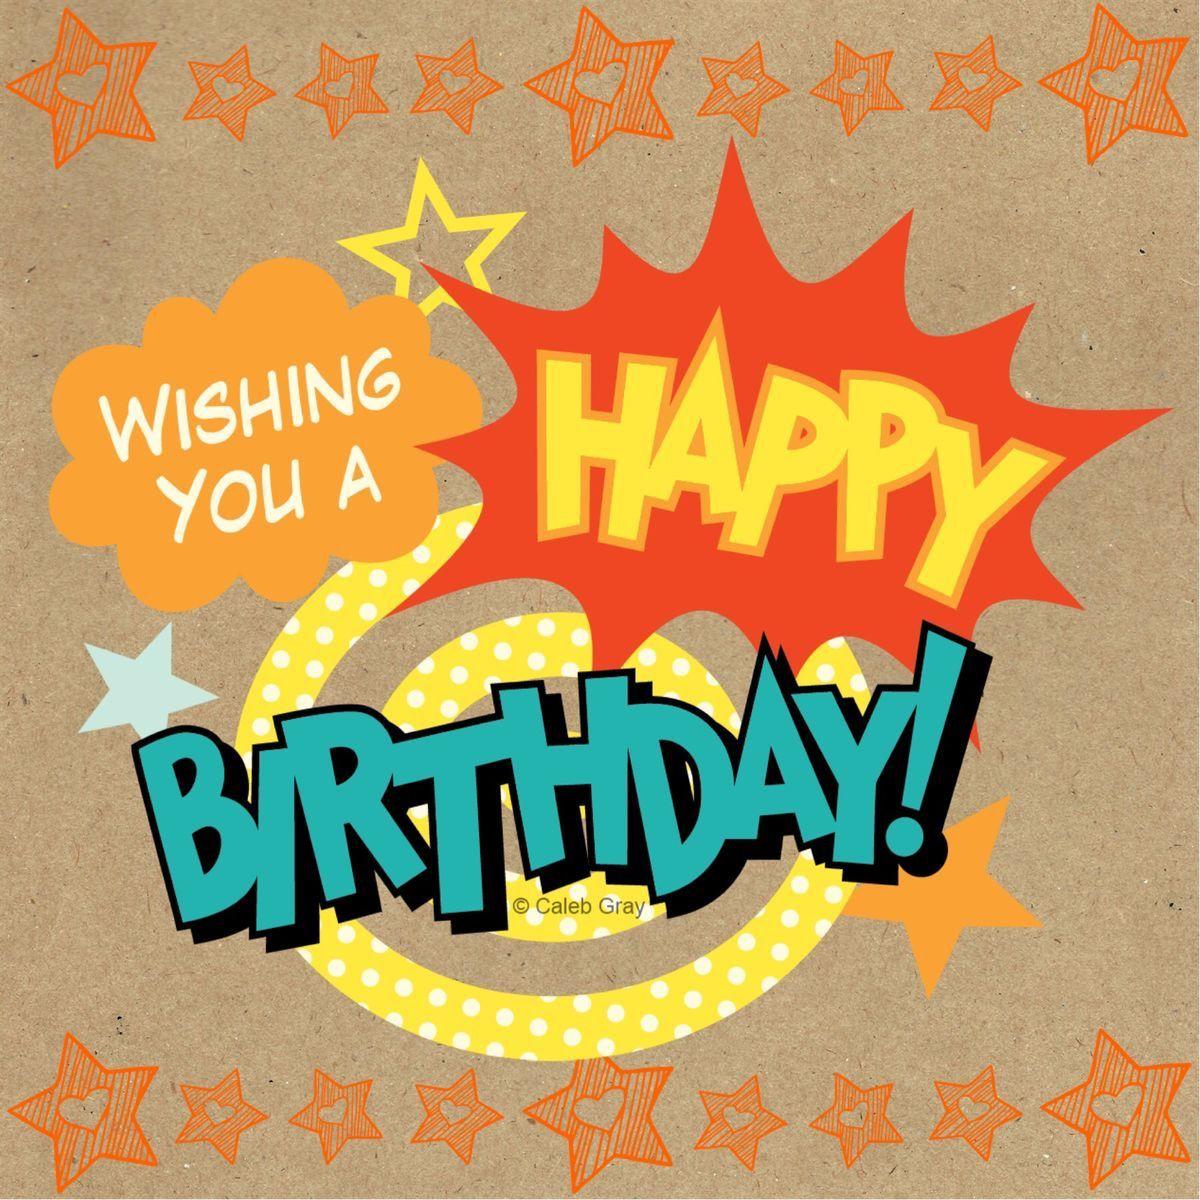 Happy Birthday - o.k. for man | HAPPY BIRTHDAY Greetings ...Happy Birthday For Men Wishes